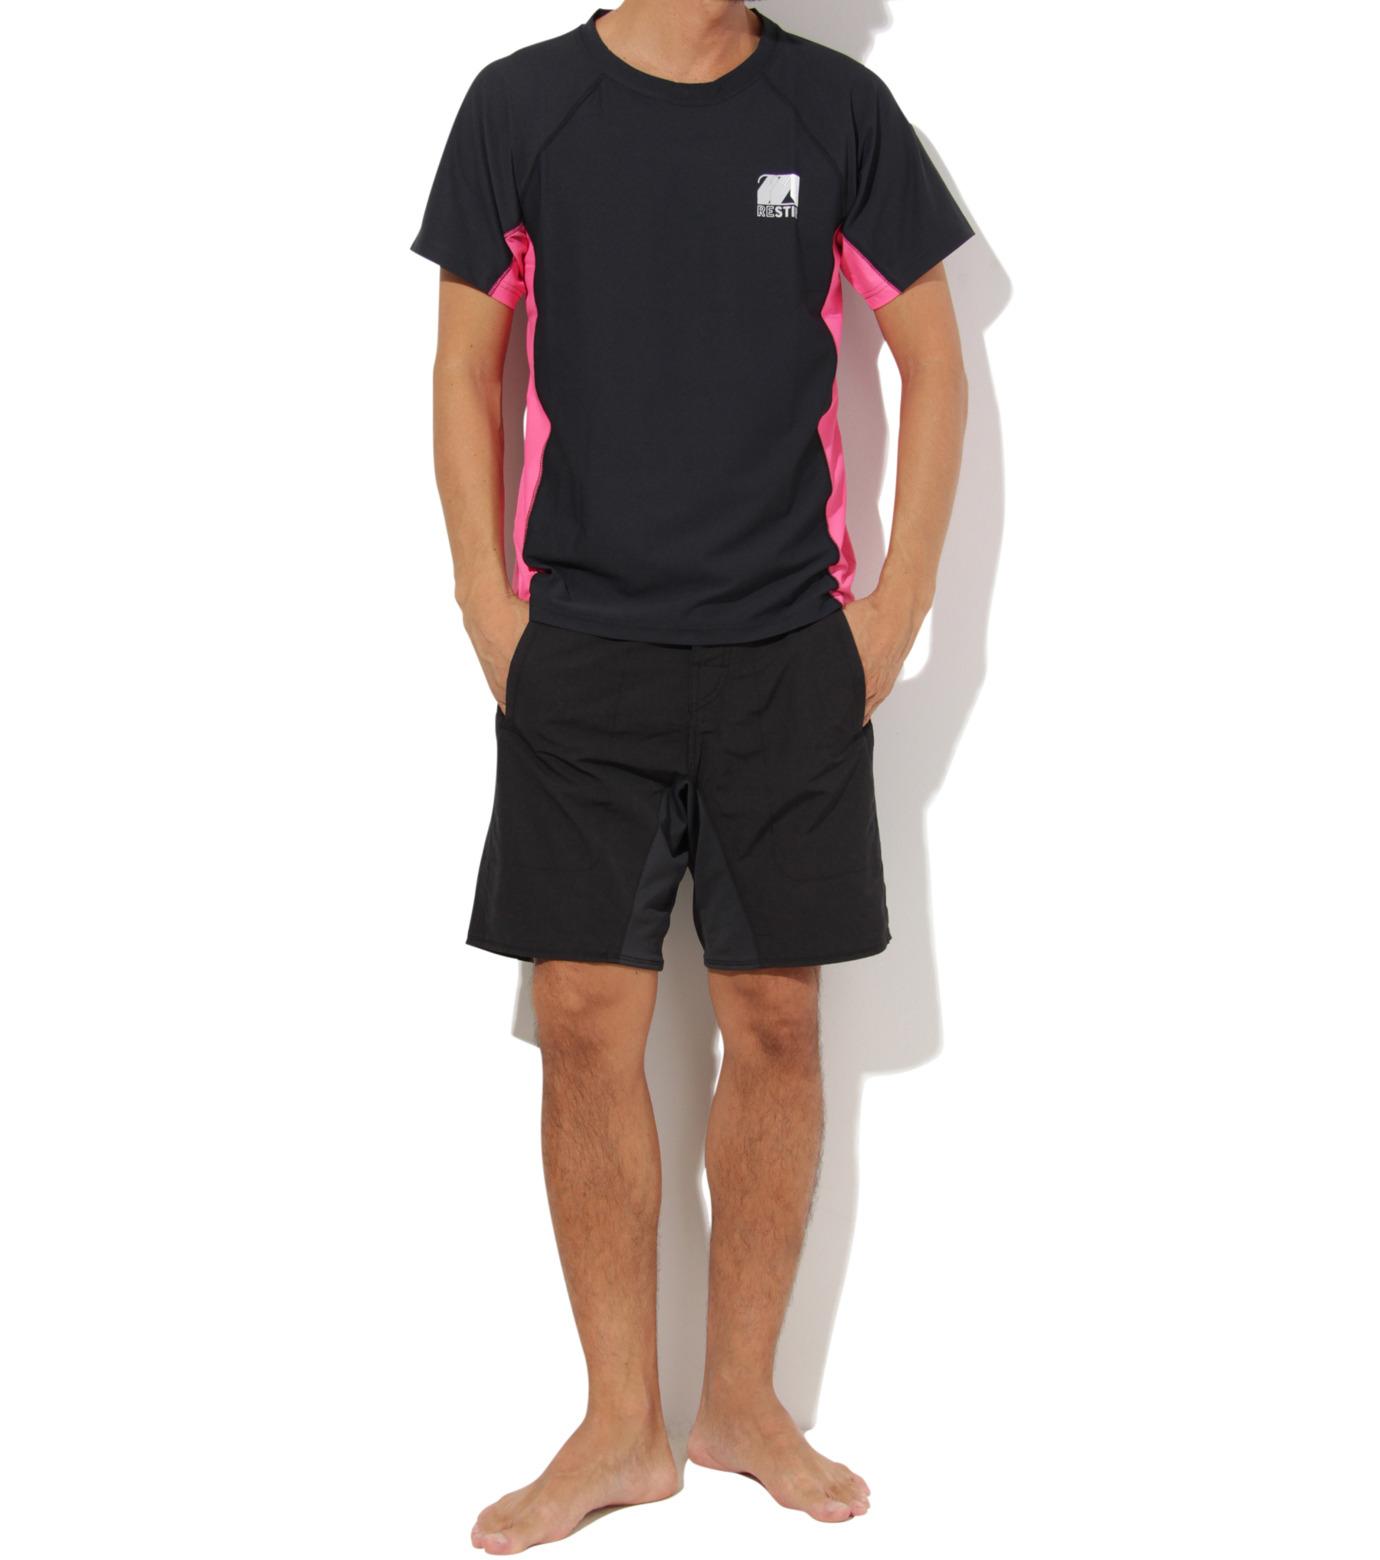 TWO TWO ONE(トゥートゥーワン)のSurf shorts short-BLACK(SWIMWEAR/SWIMWEAR)-15N948001-13 拡大詳細画像5